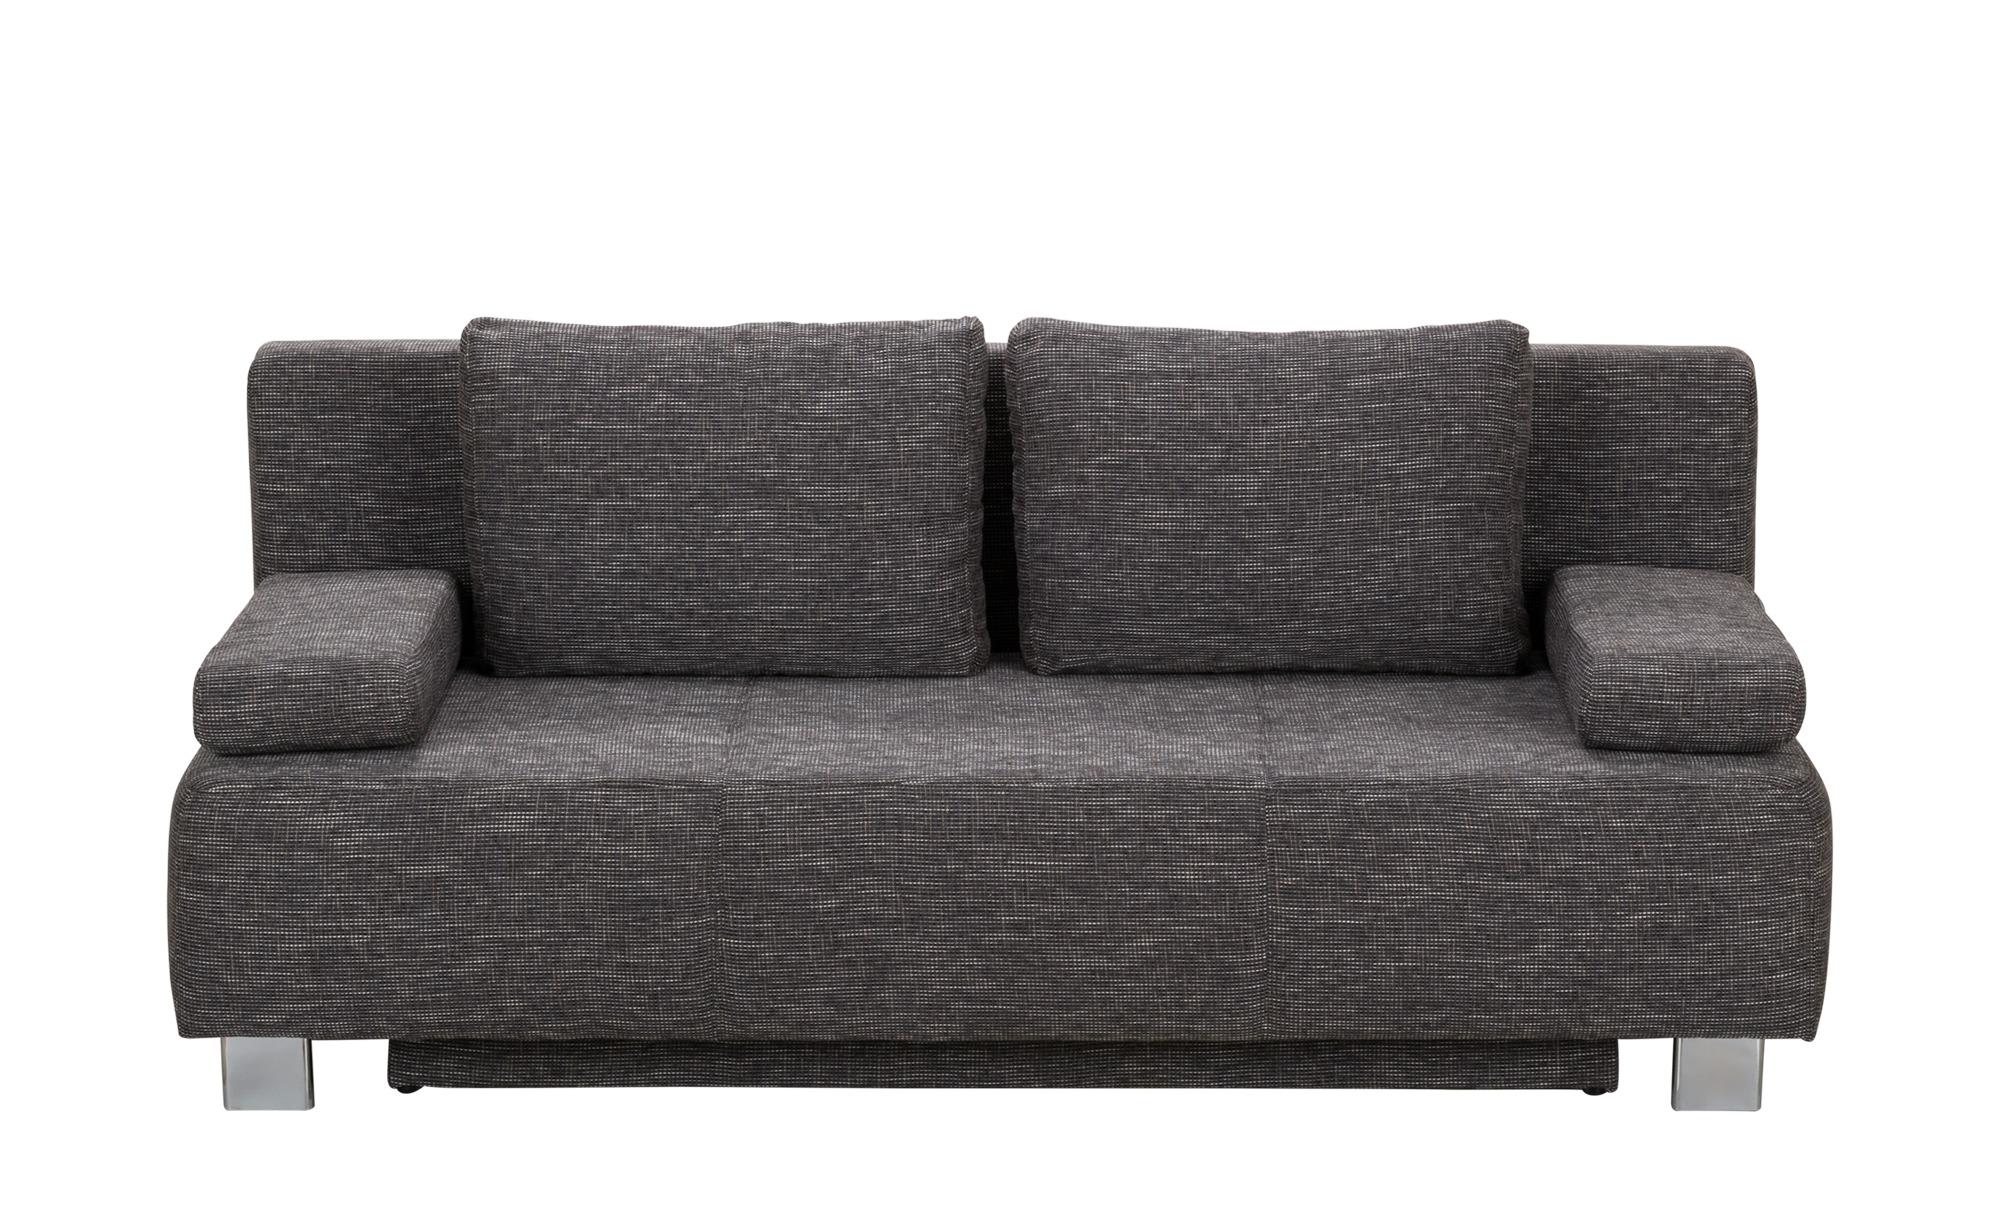 Schlafcouch Grau Webstoff Donald Schlafcouch Couch Gunstig